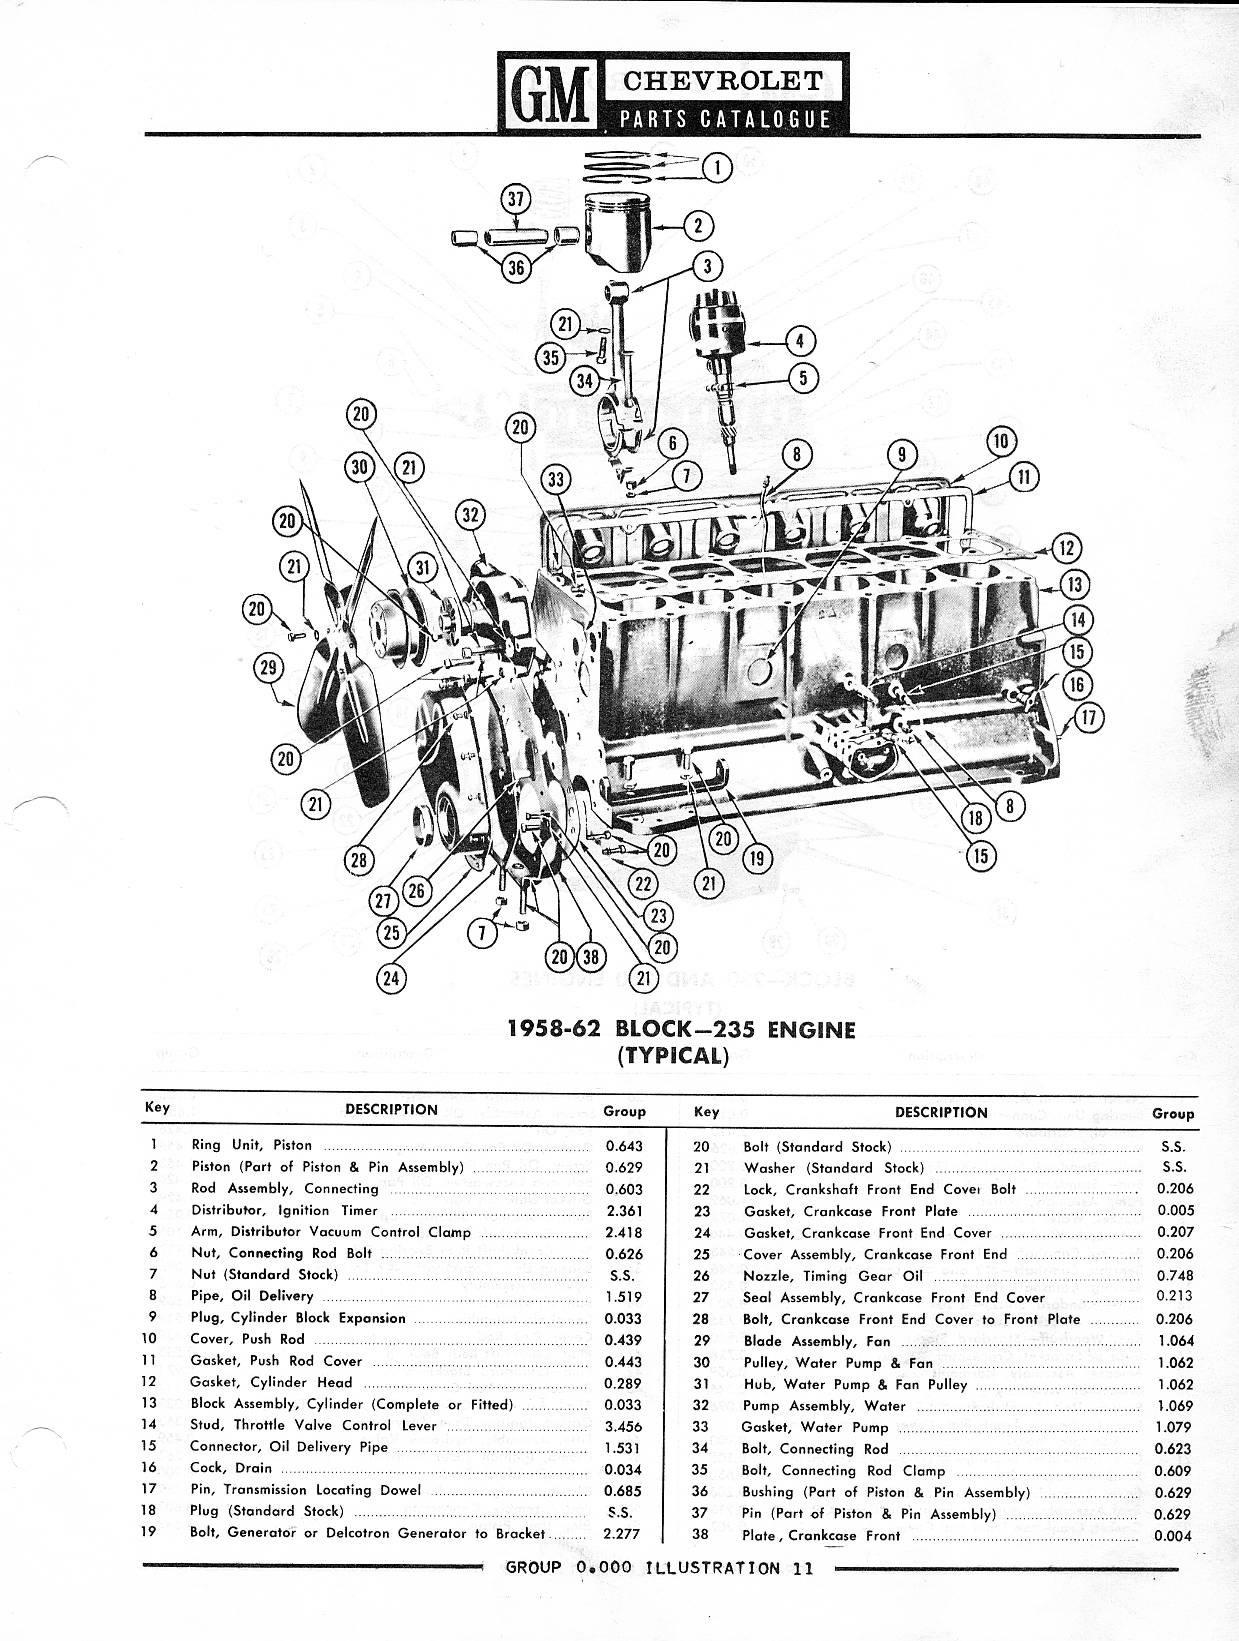 1958-1968 Chevrolet Parts Catalog / Image126.jpg